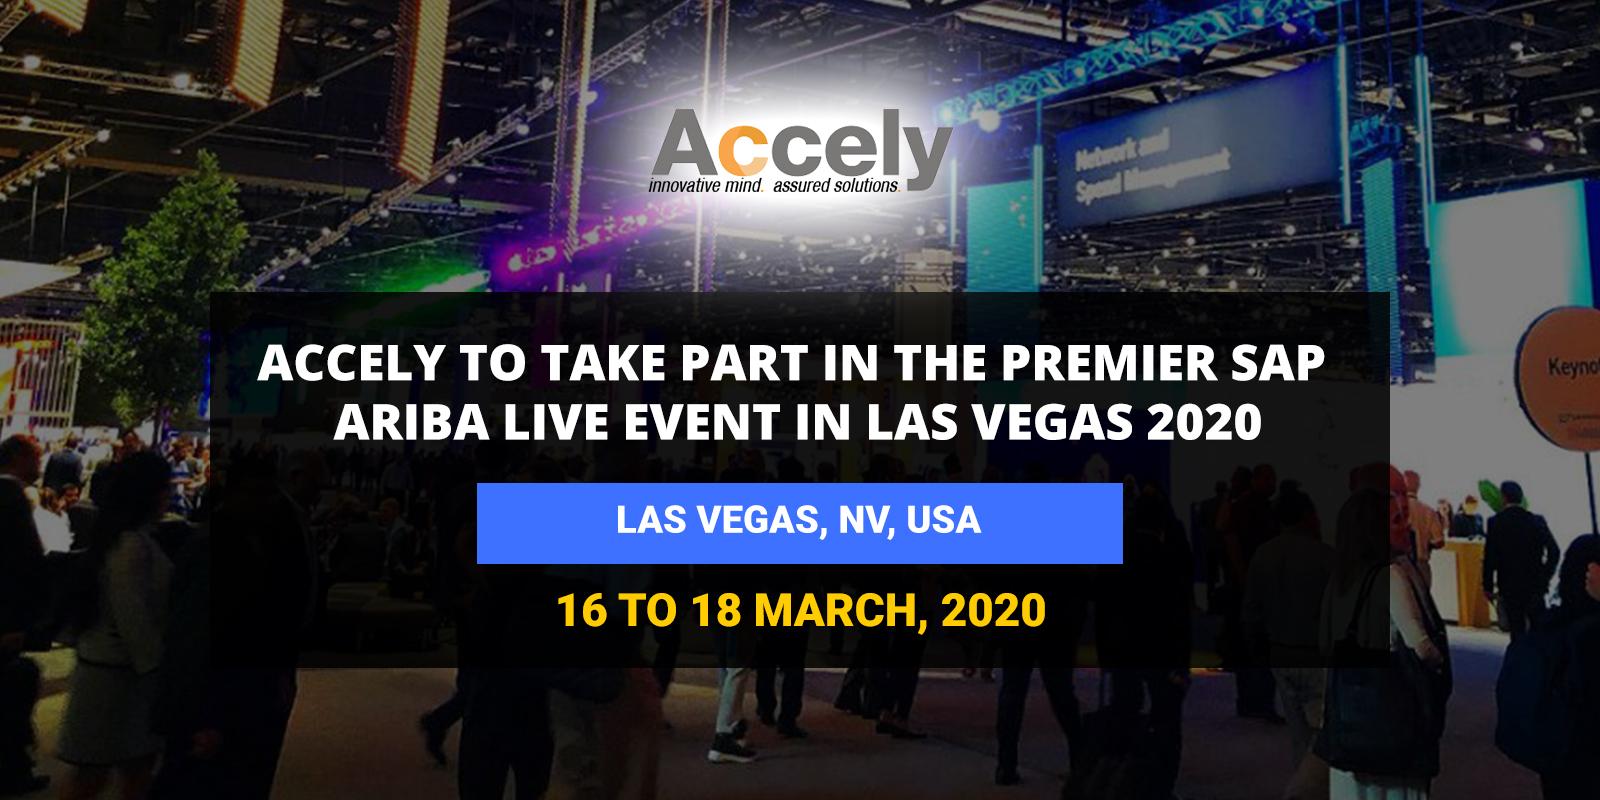 Premier SAP Ariba Live Event in Las Vegas 2020